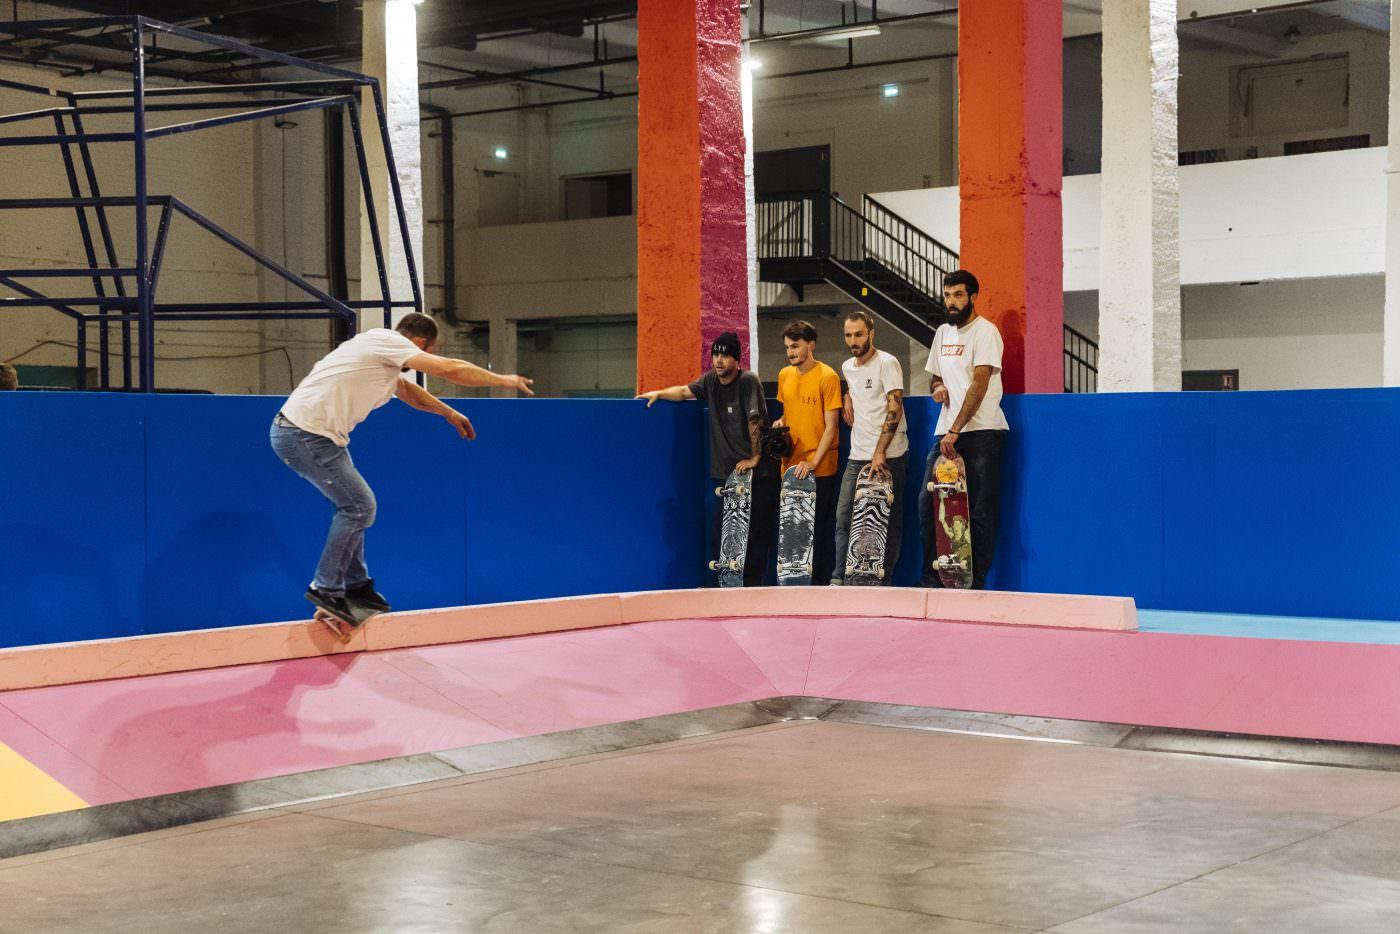 Yinka Ilori, Colorama Skatepark Lille, France | Yellowtrace